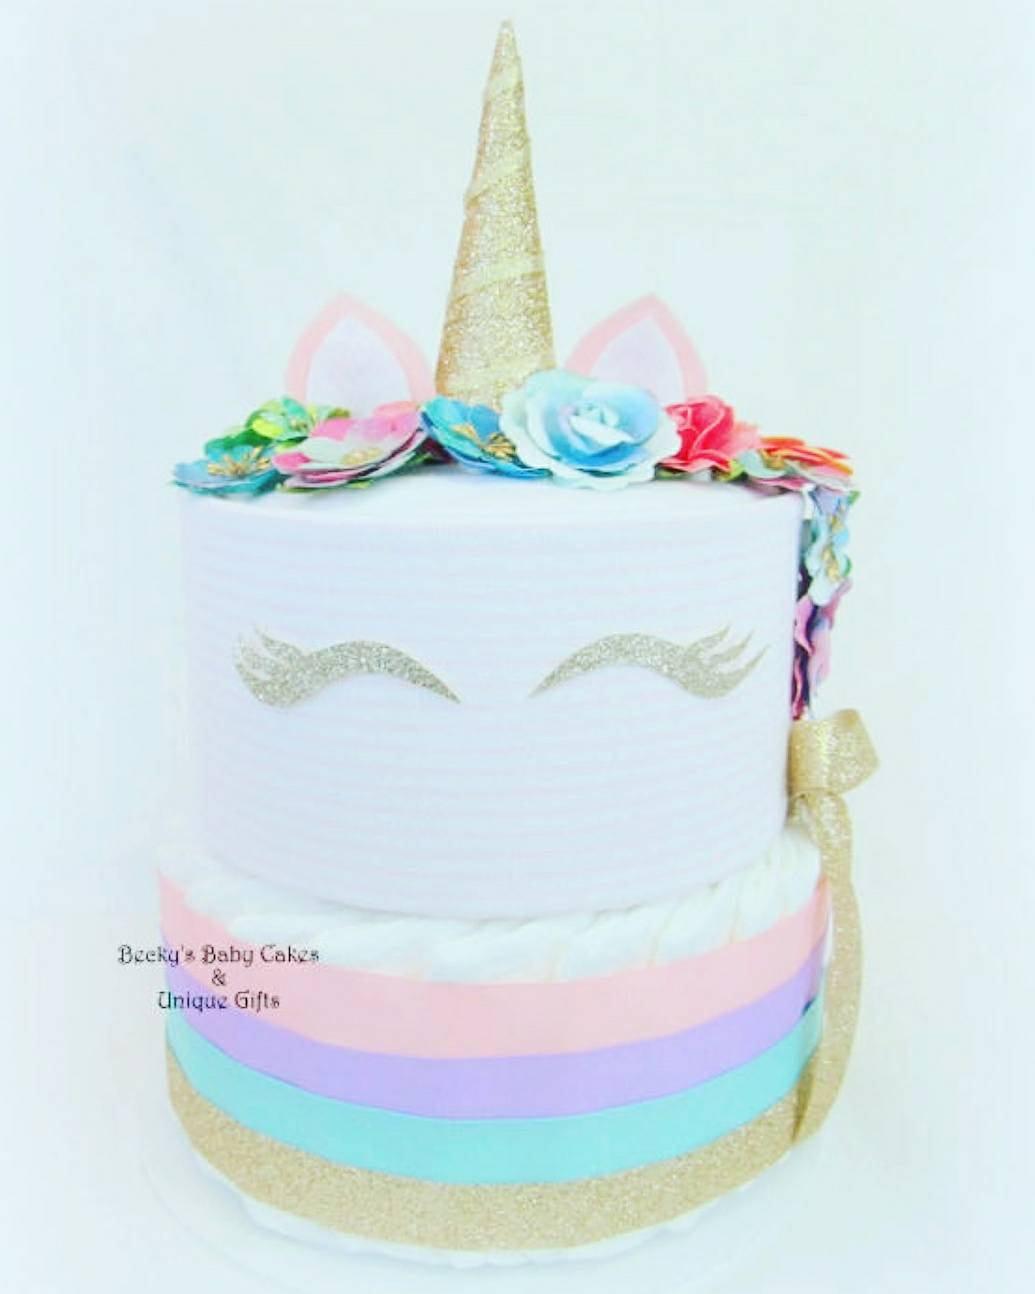 Cool diaper cakes: Unicorn diaper cake | Becky's Baby Cakes